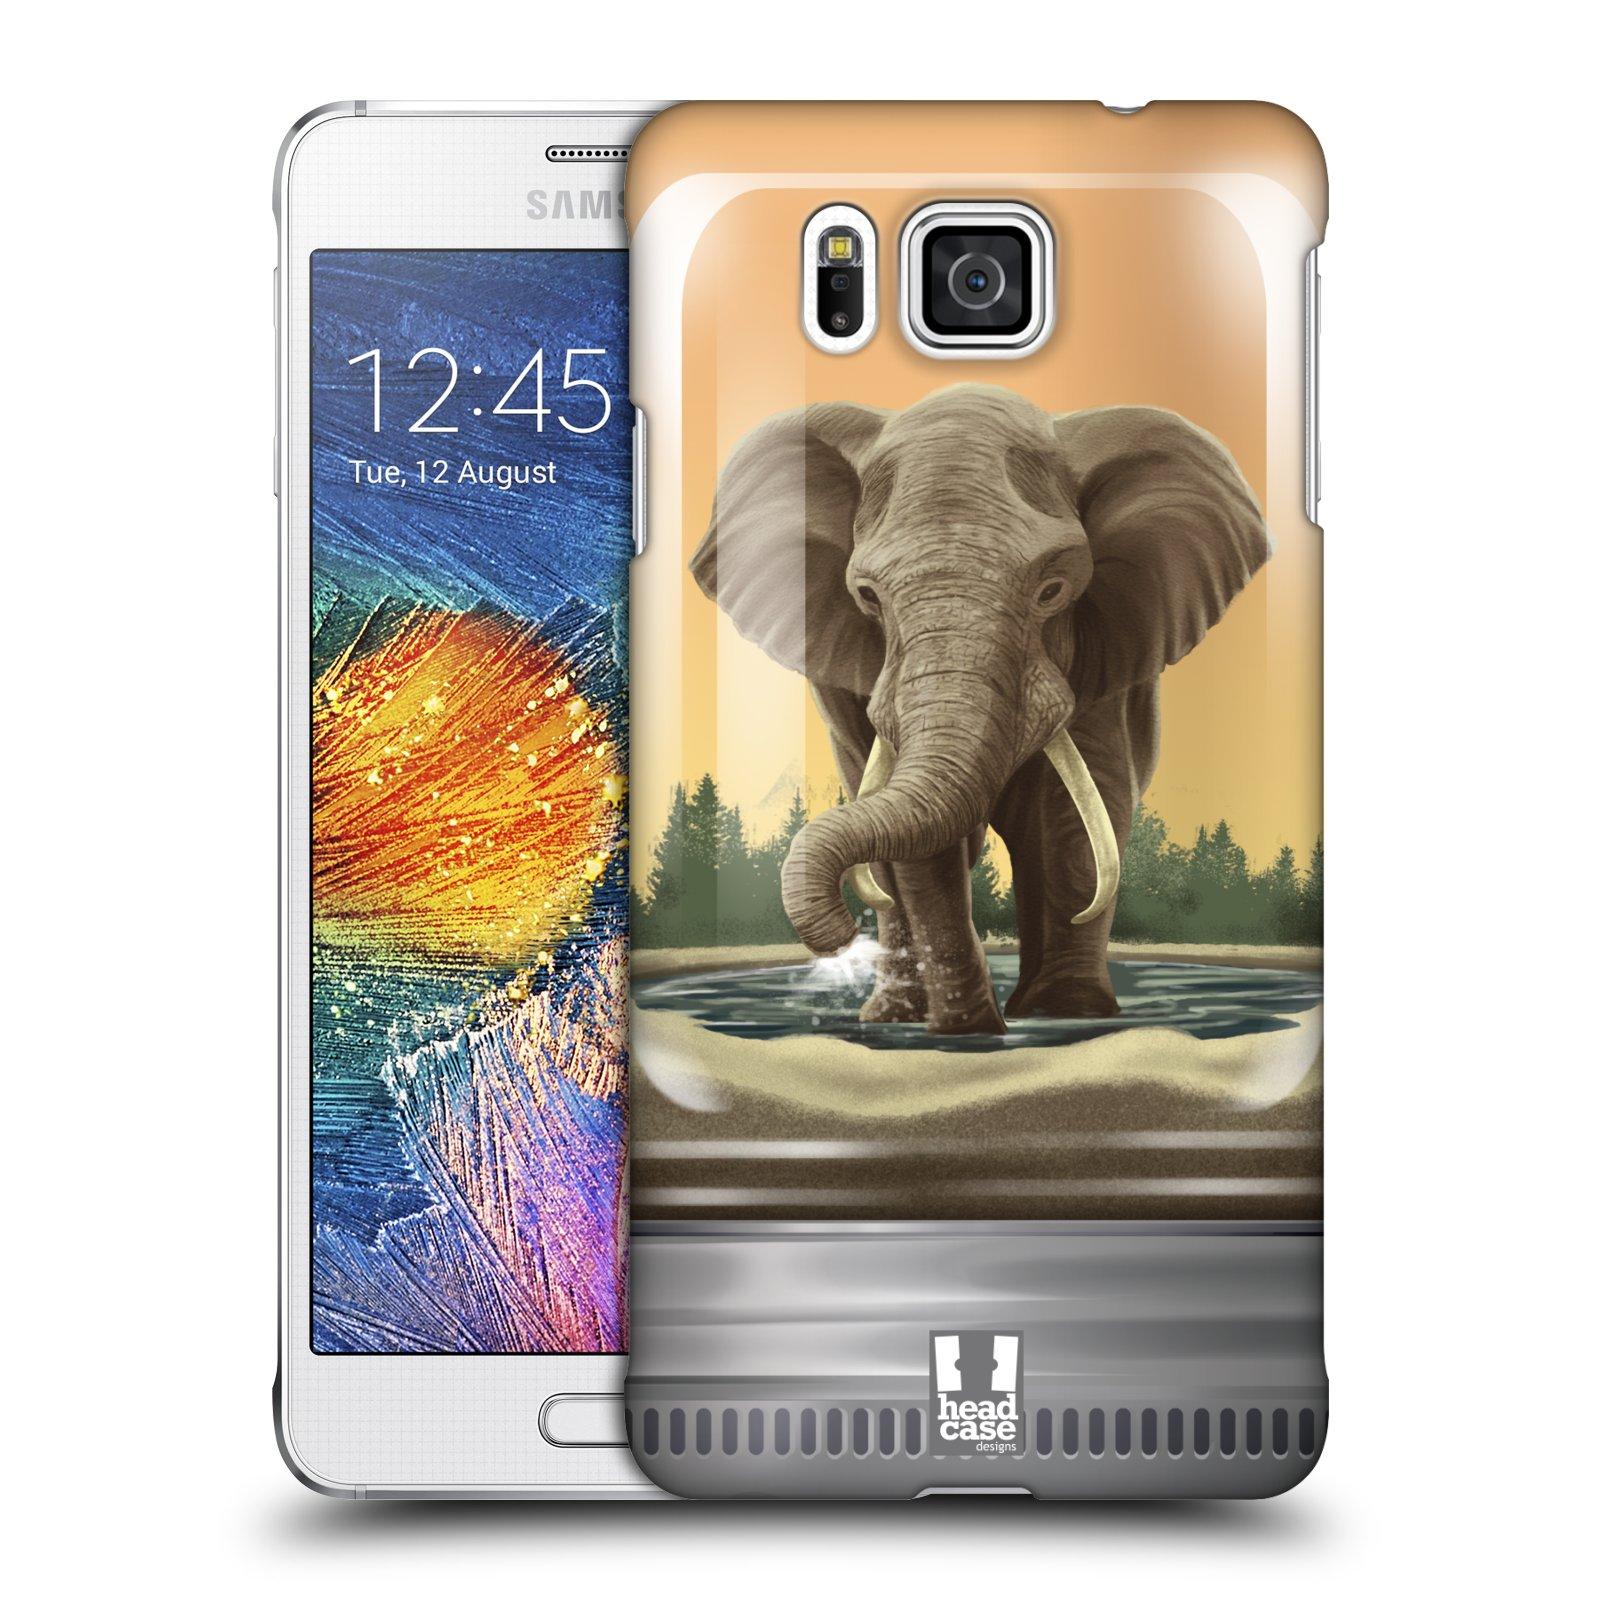 HEAD CASE plastový obal na mobil SAMSUNG Galaxy Alpha (G850) vzor Zvířátka v těžítku slon